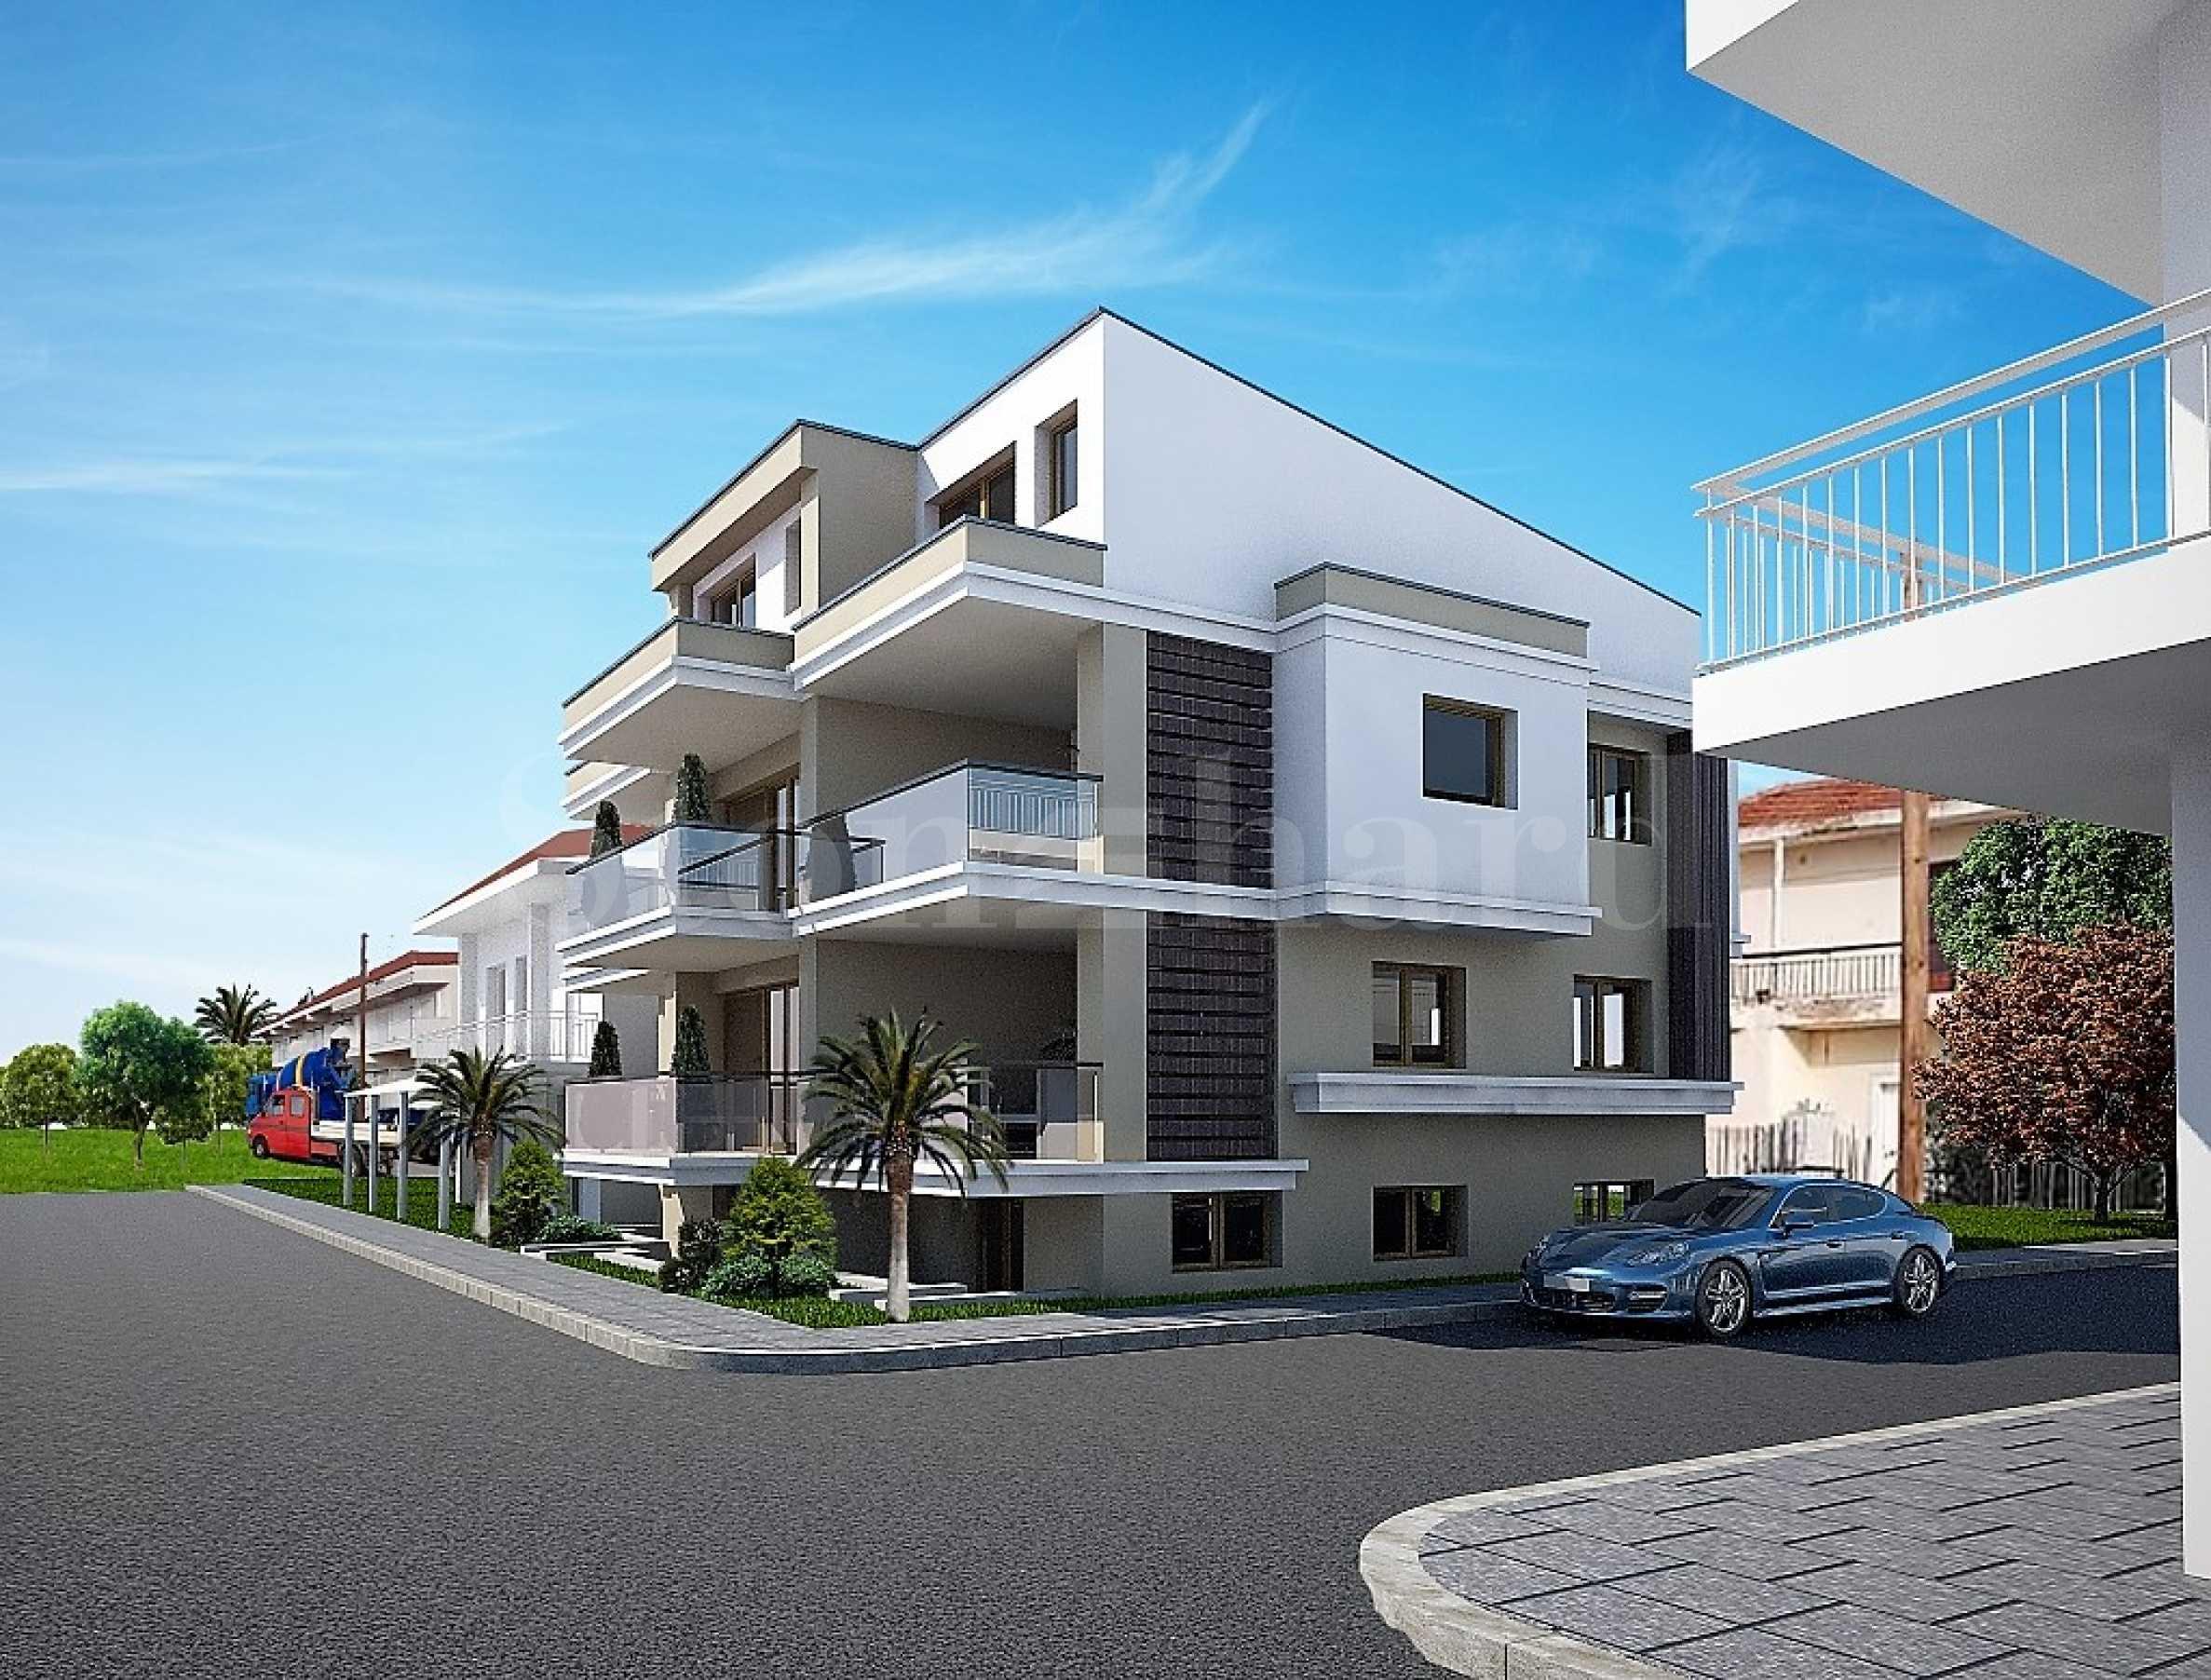 1-bedroom apartment in 2 - Stonehard